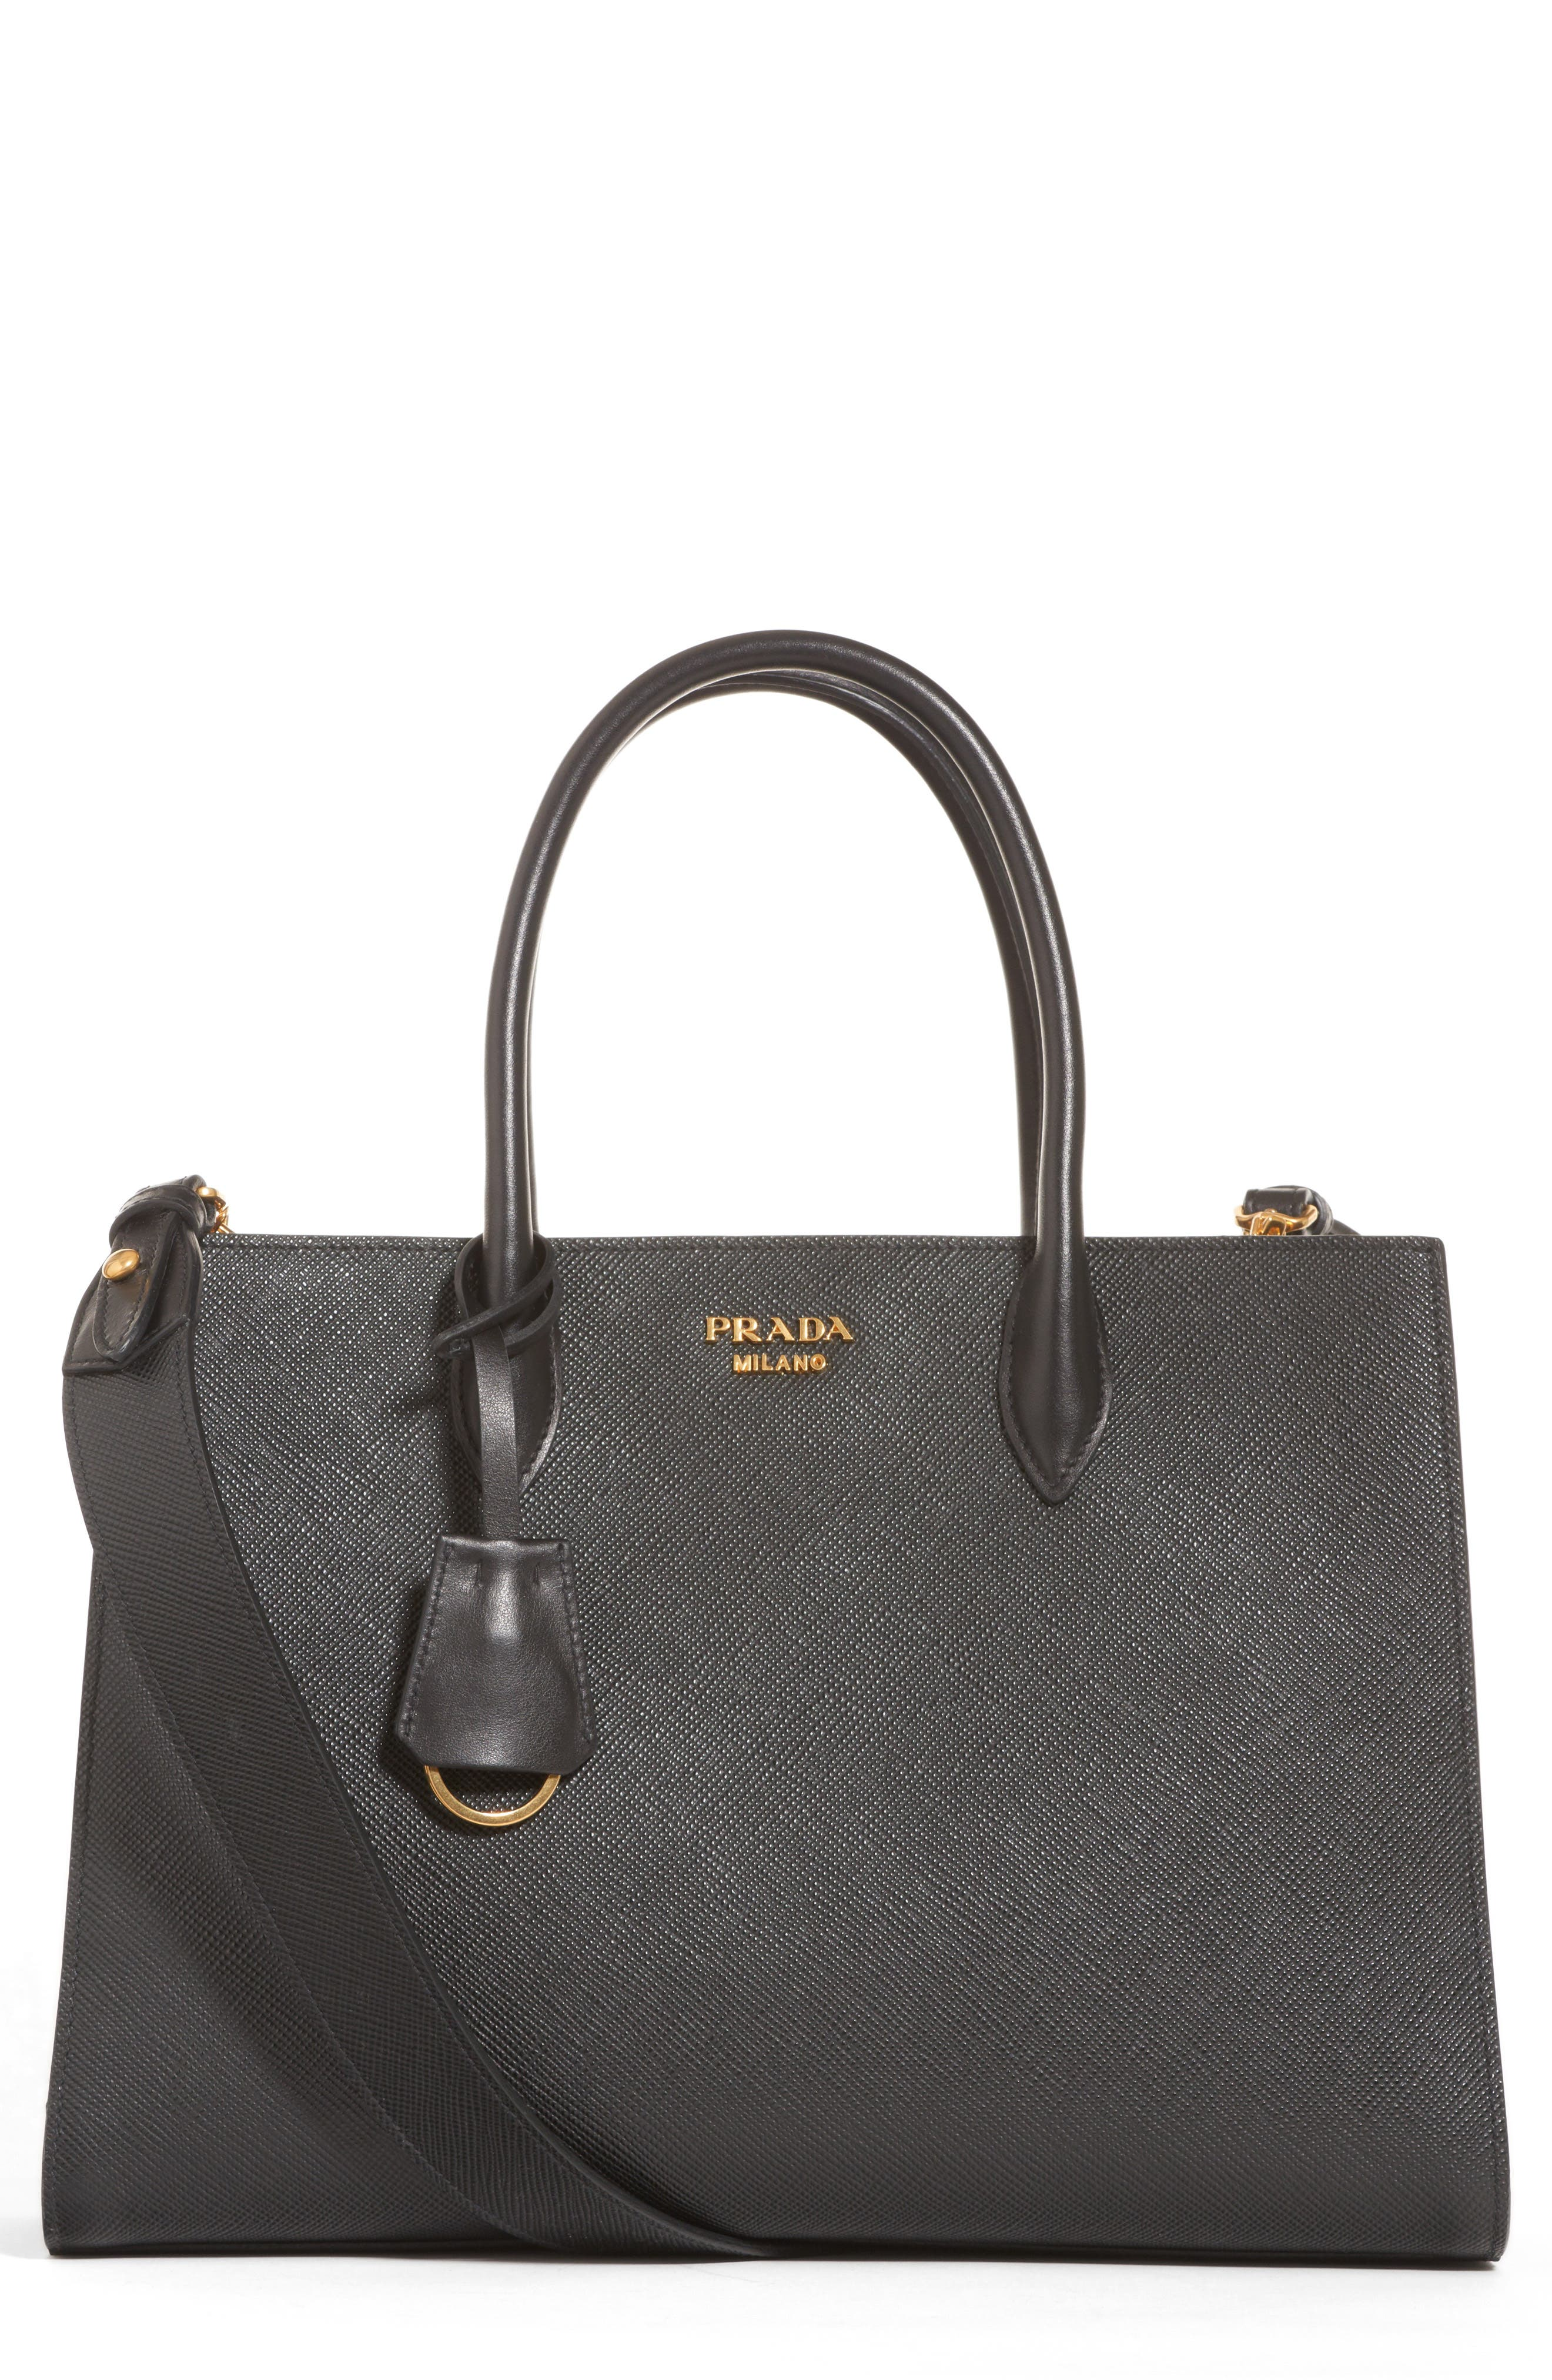 australia prada cahier leather shoulder bag ad73f bedf5  cheap prada medium  saffiano leather tote 5fb50 521d0 69f8f4e14d589